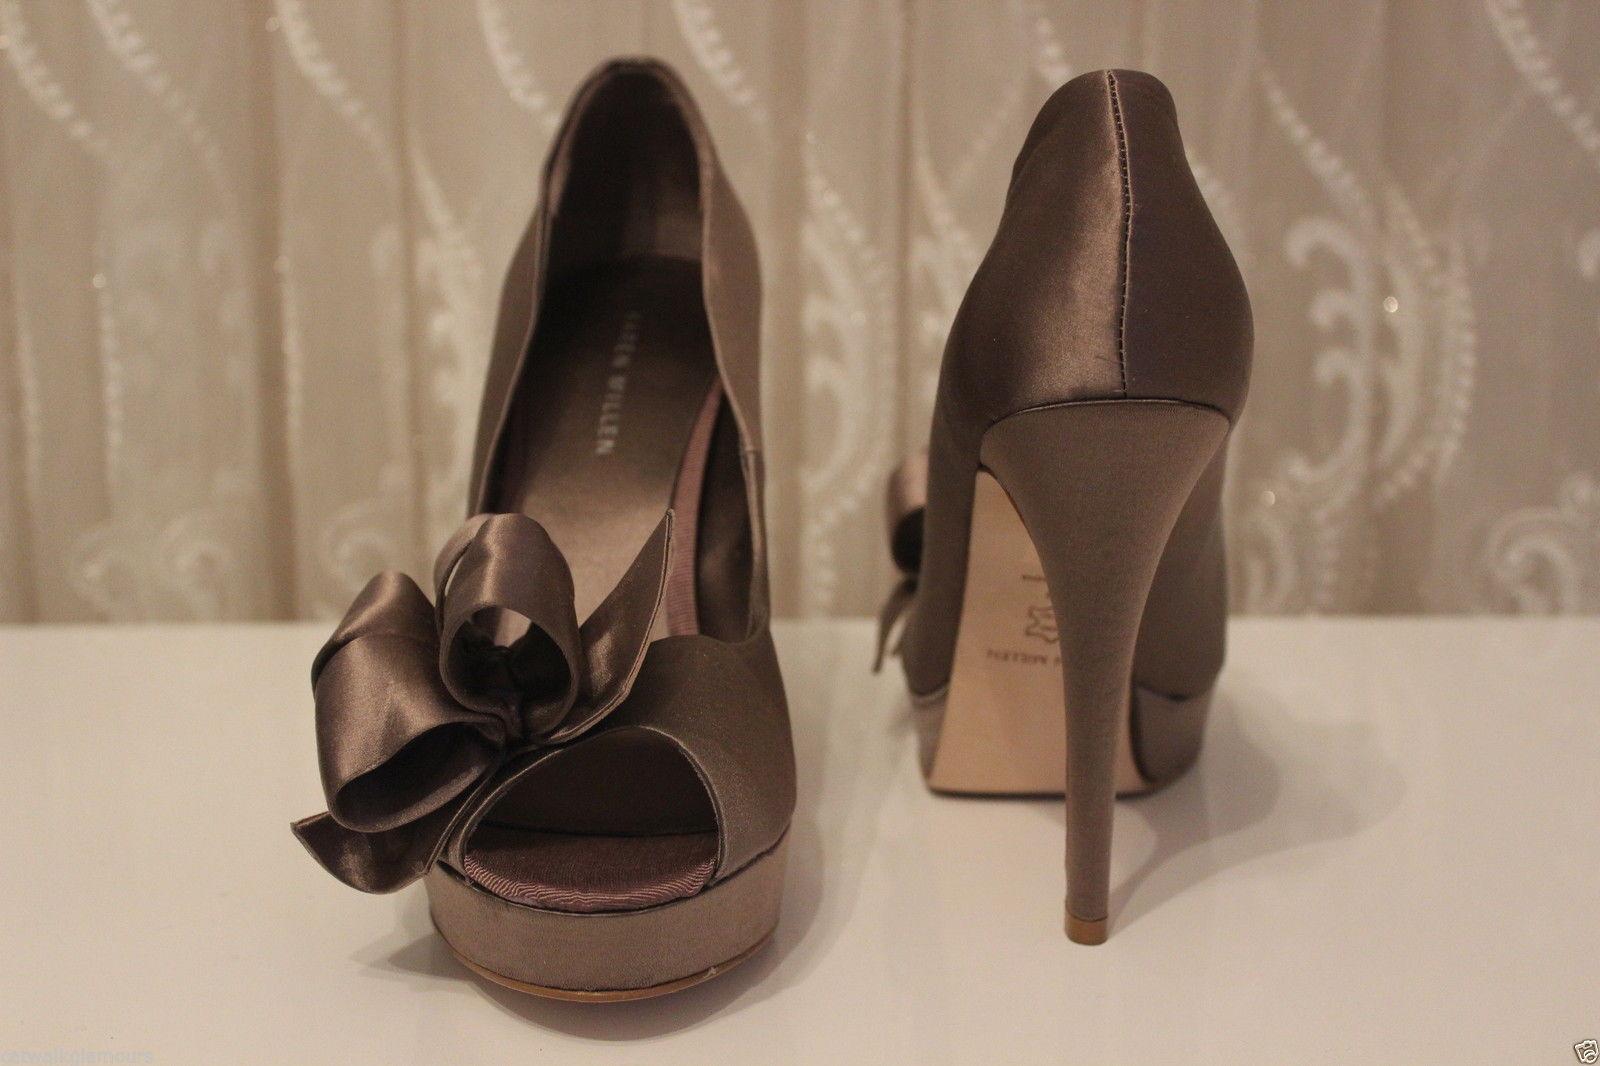 Karen Millen Bow Peep Toe Taupe Platform High Satin Wedding 39 Party Schuhes UK 6 39 Wedding e13cd3